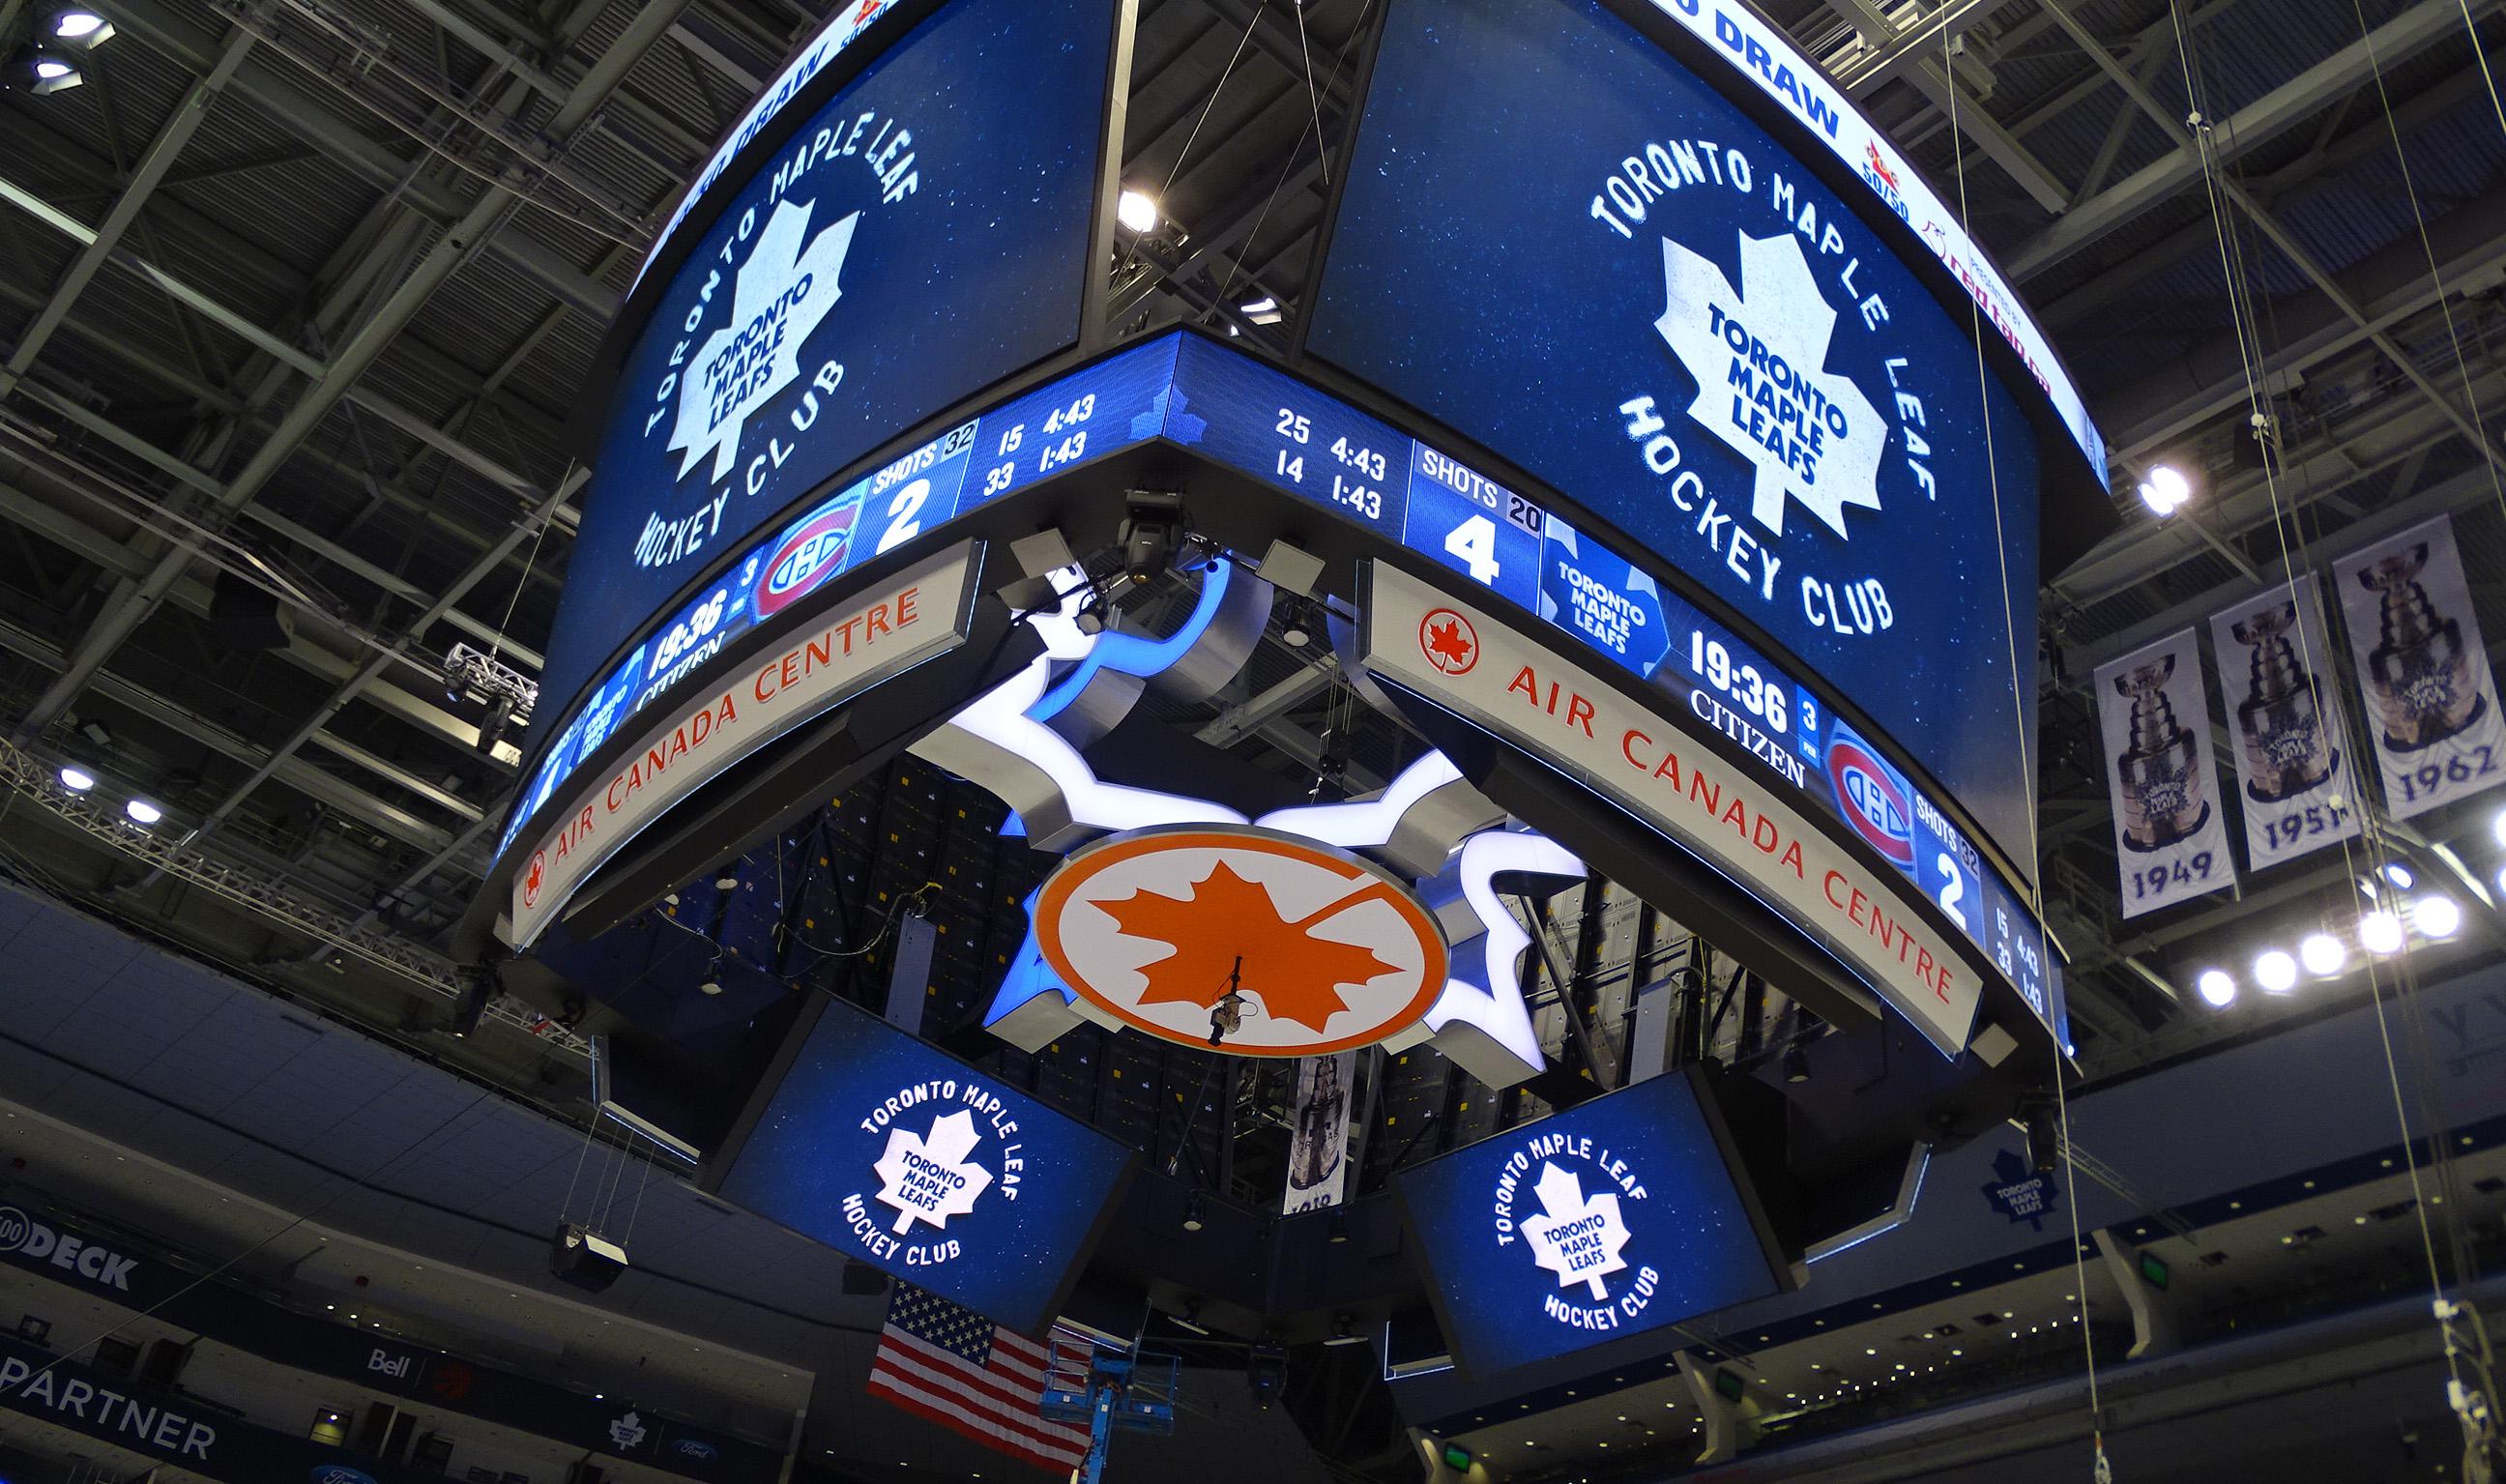 MLSE, Air Canada Centre, Toronto Maple Leafs